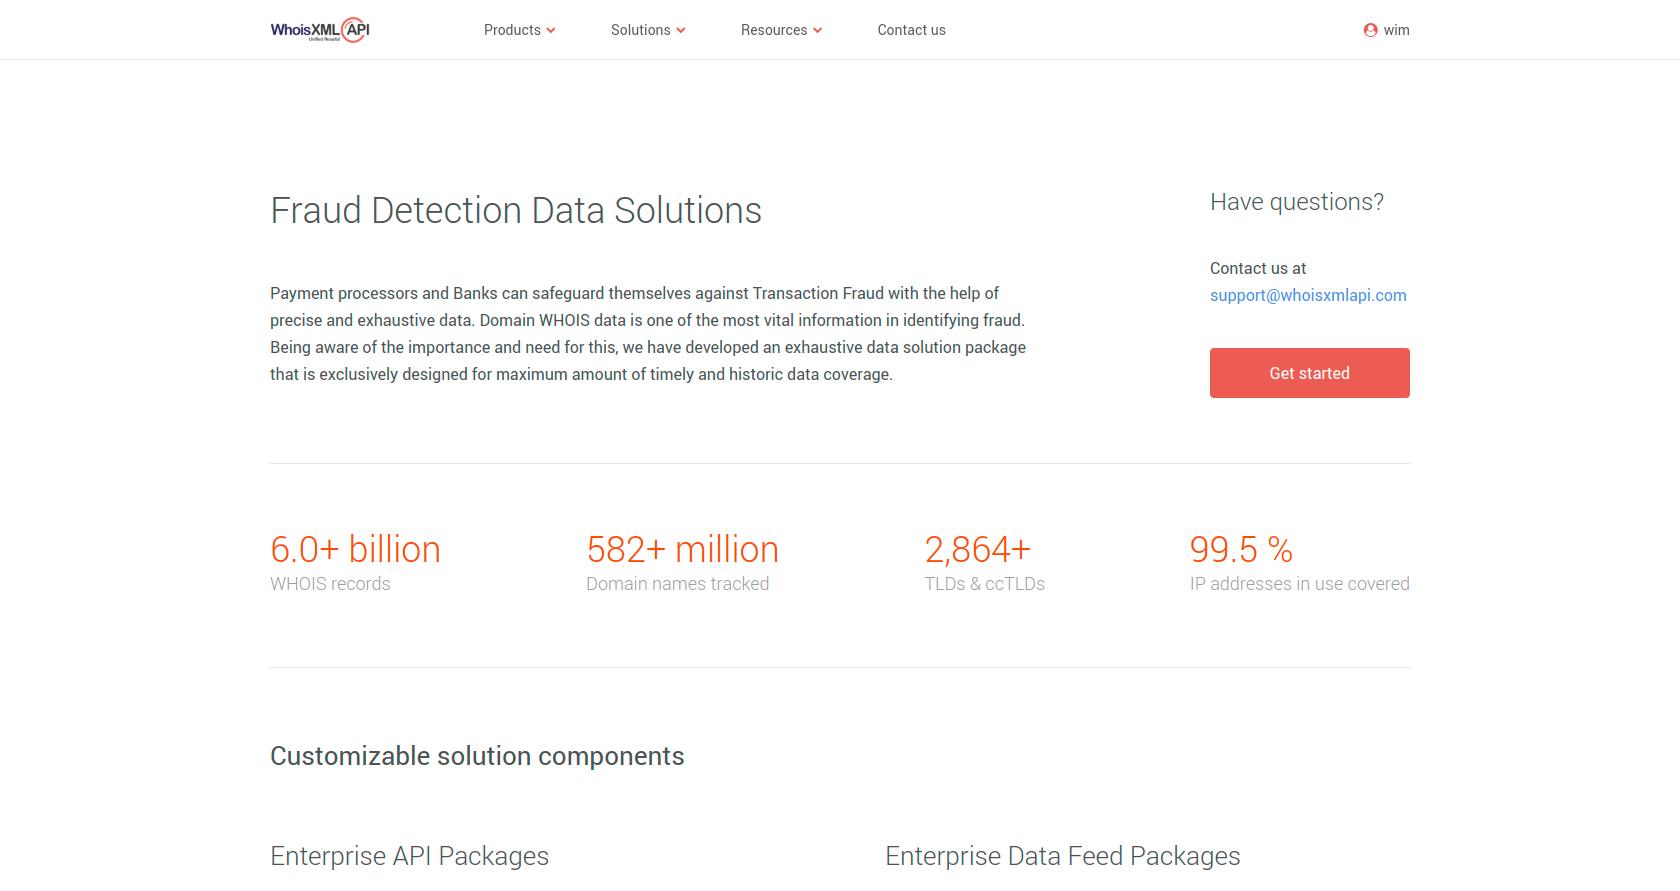 Fraud Detection Data Solutions | WhoisXML API